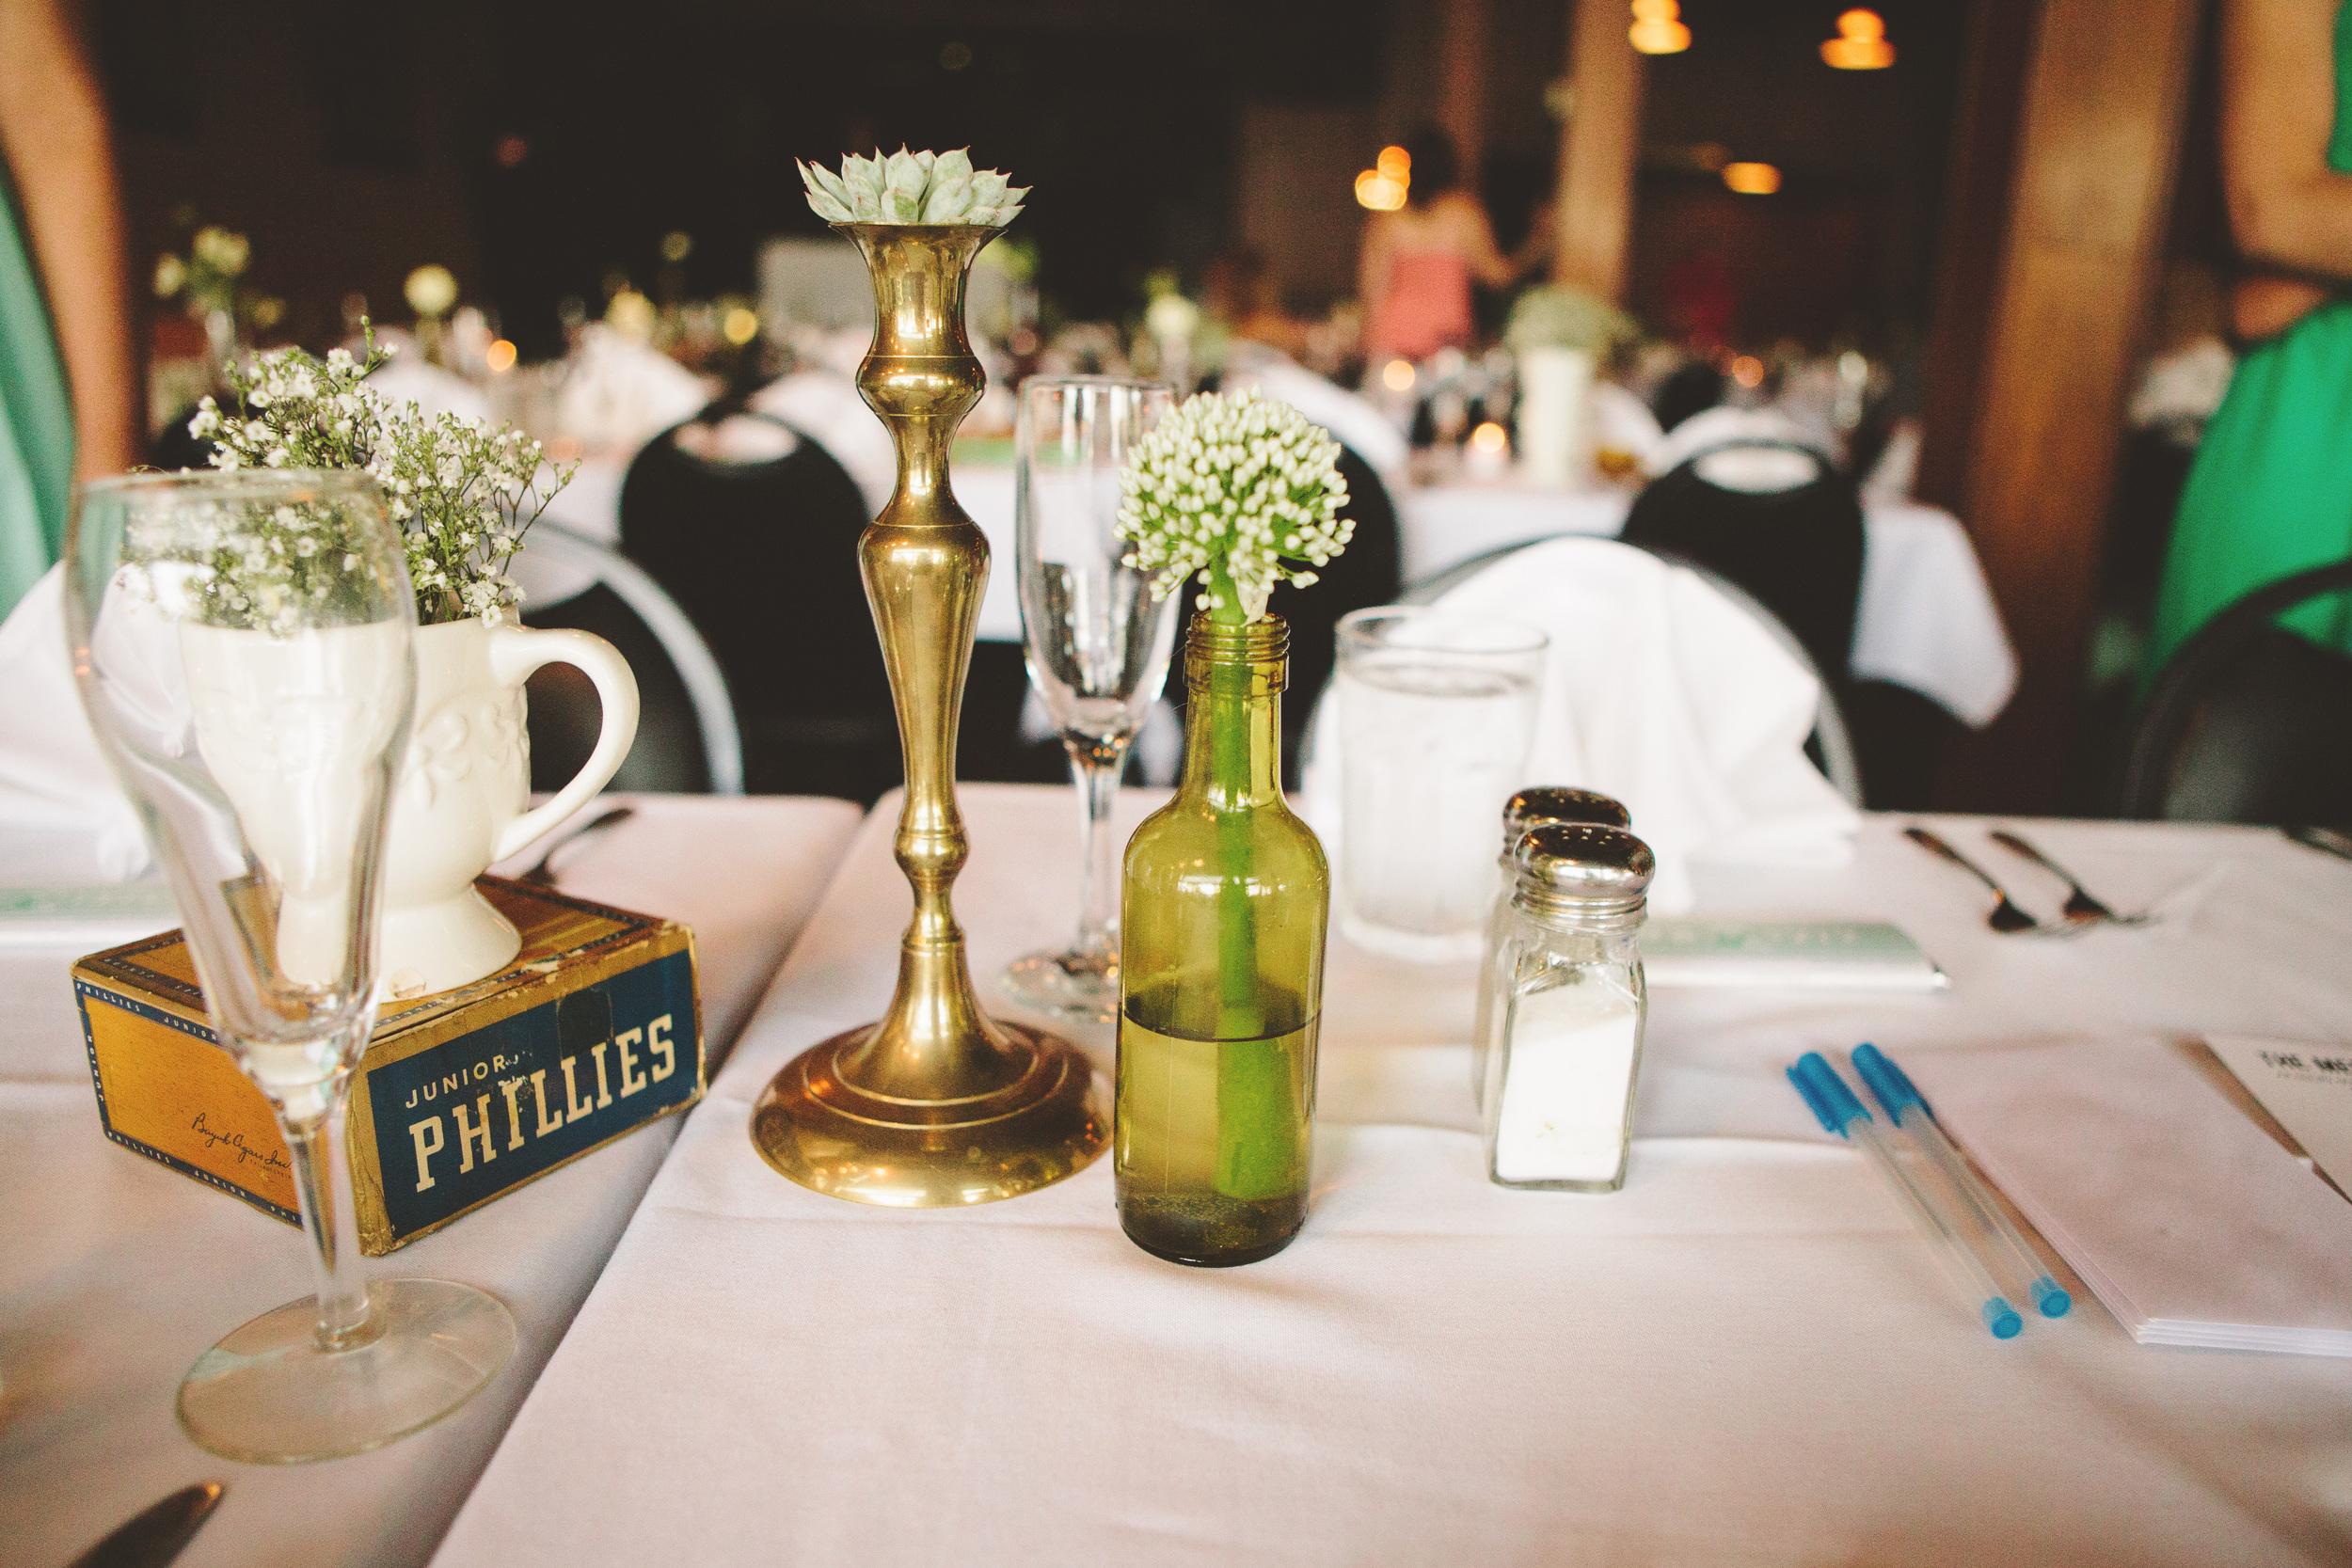 the-bees-knees-floral-design-studio-brainerd-mn-minnesota-florist-wedding-weddings-bride-greenery-vintage-decor-table-centerpiece